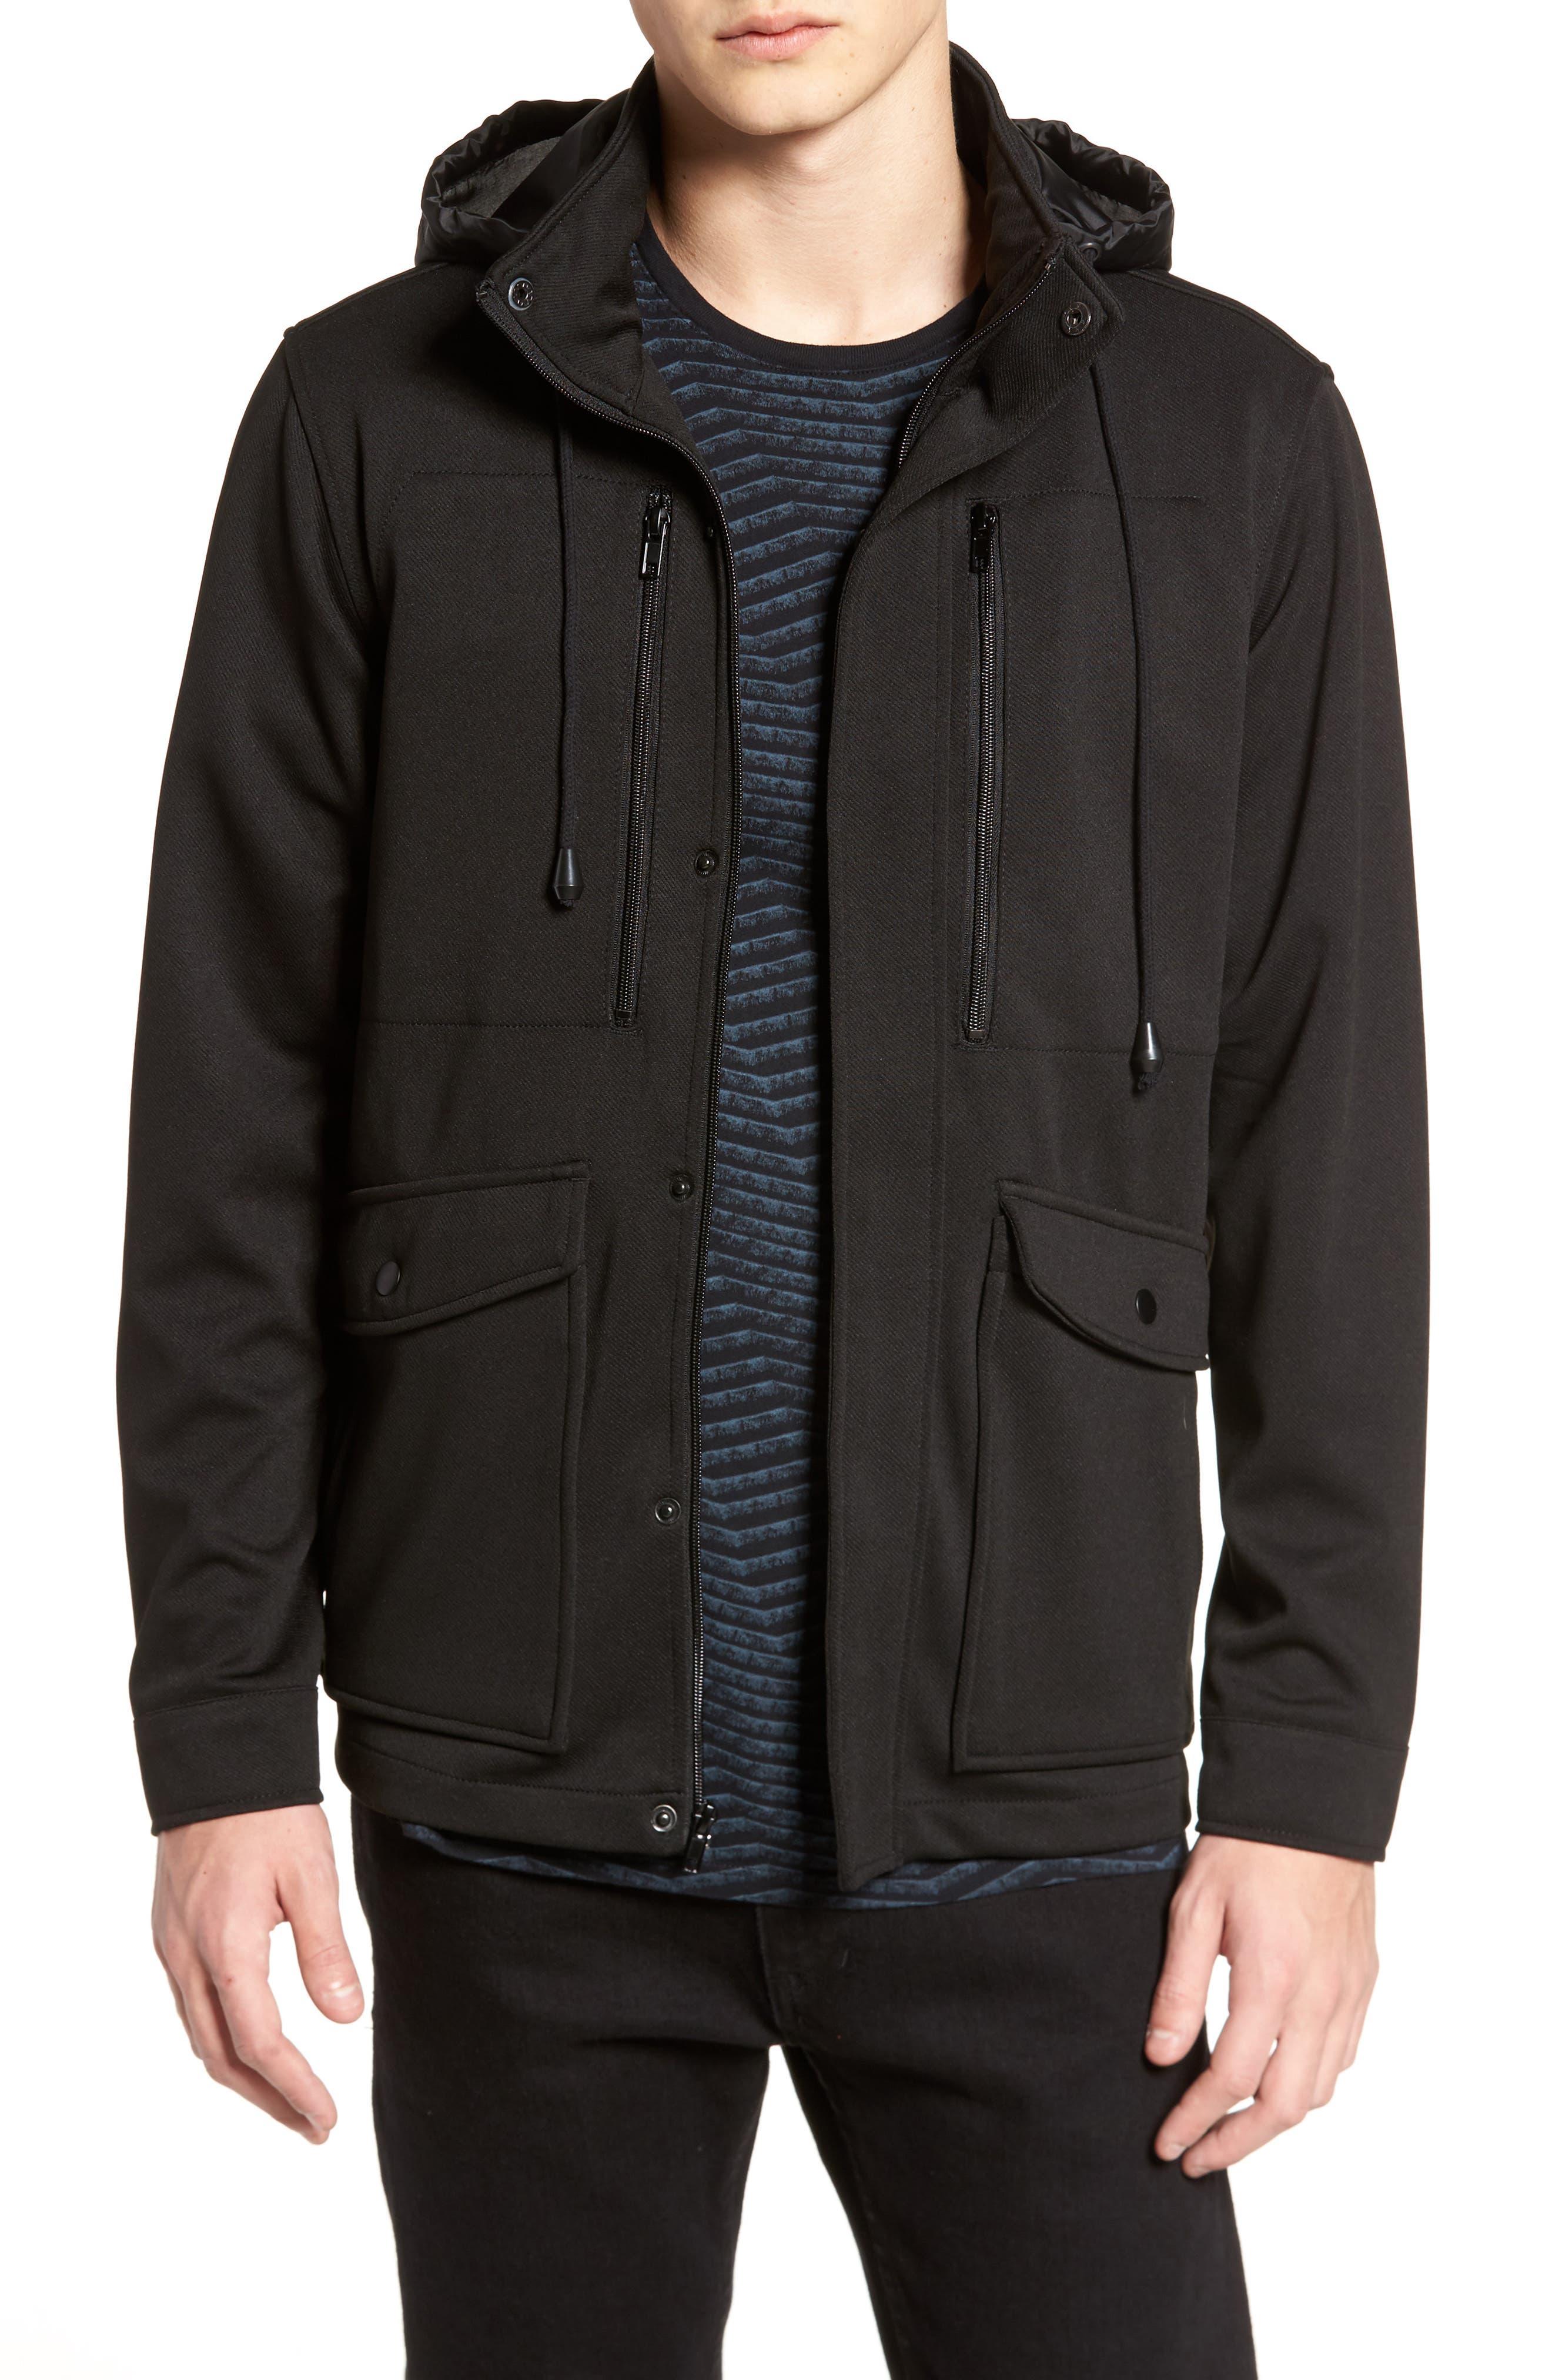 Woven Jacket with Back Pocket,                         Main,                         color, Black